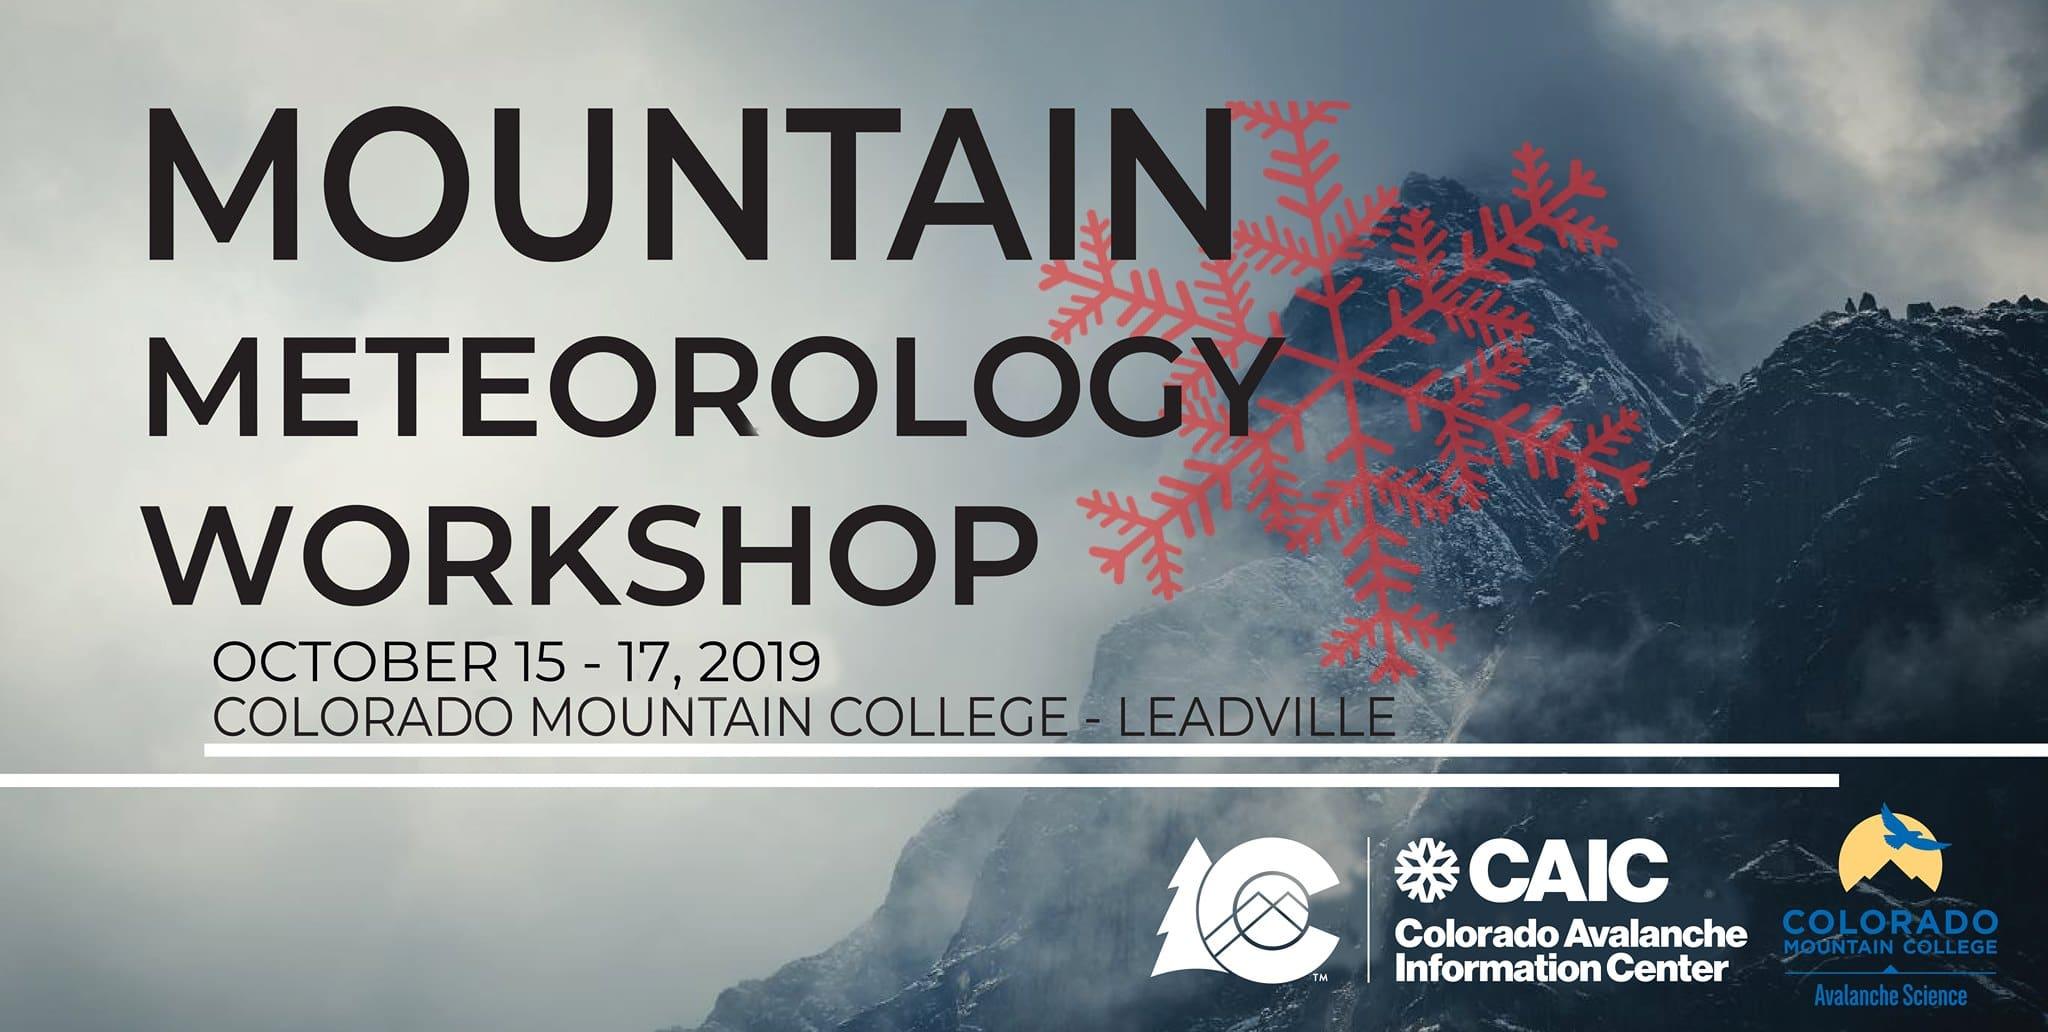 Avalanche Science - Colorado Mountain College